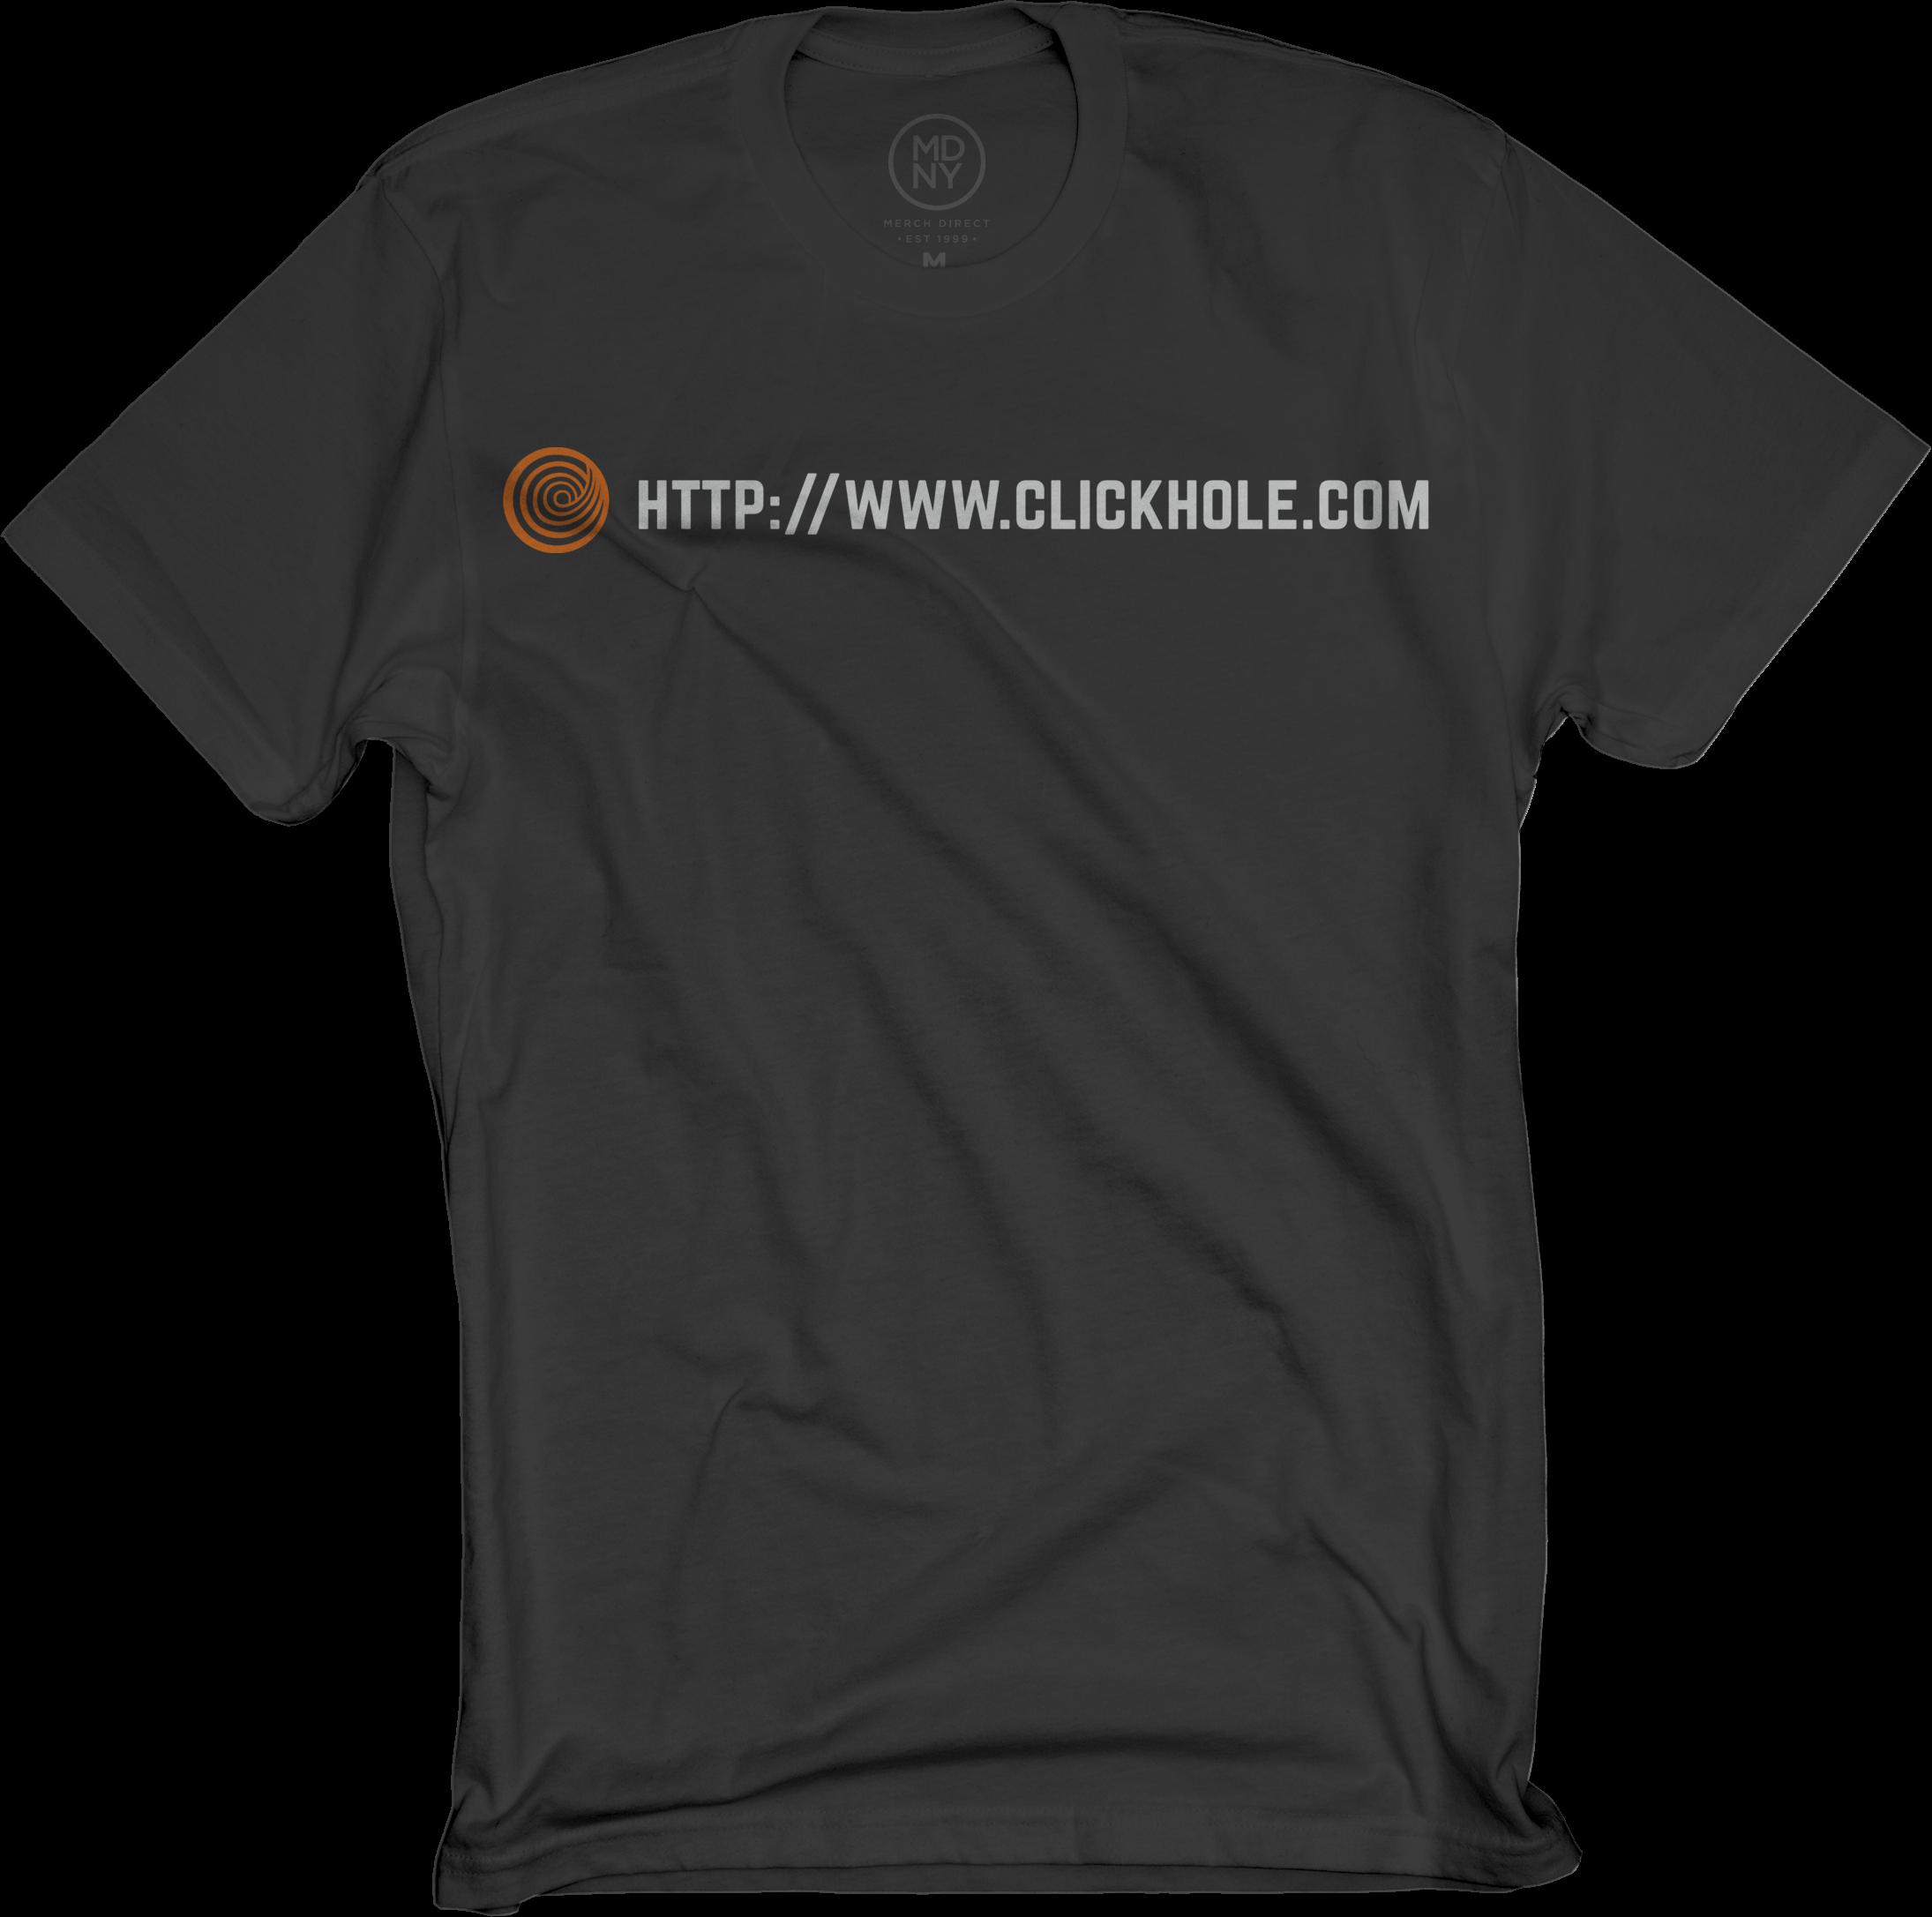 ClickHole URL Shirt In Black